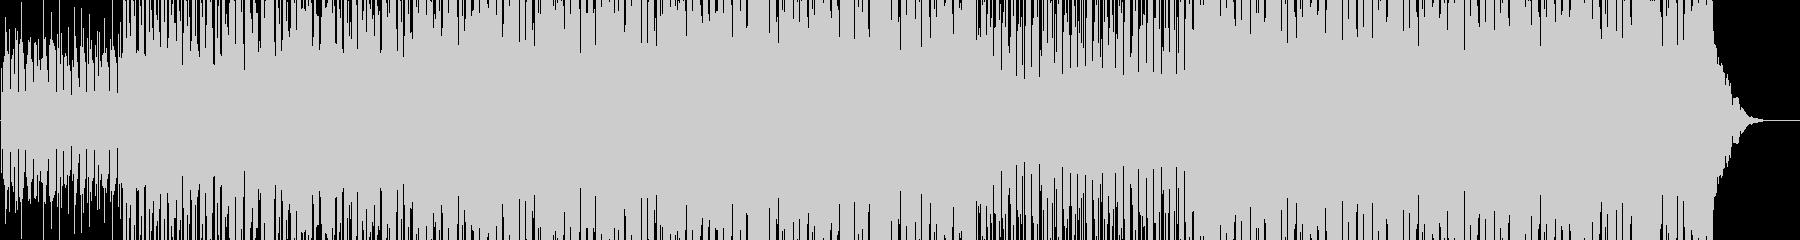 Techno with a sense of near future's unreproduced waveform